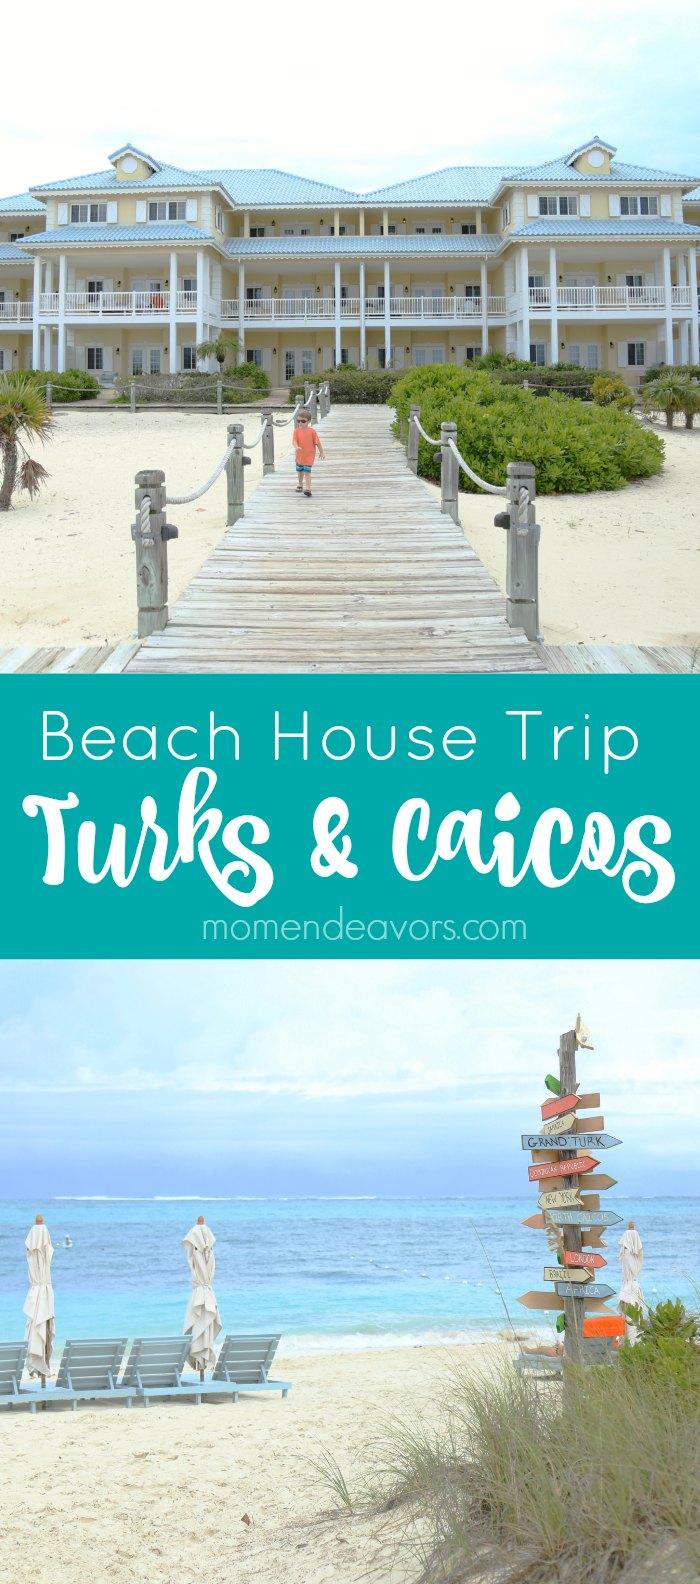 Beach House Turks & Caicos Trip Idea